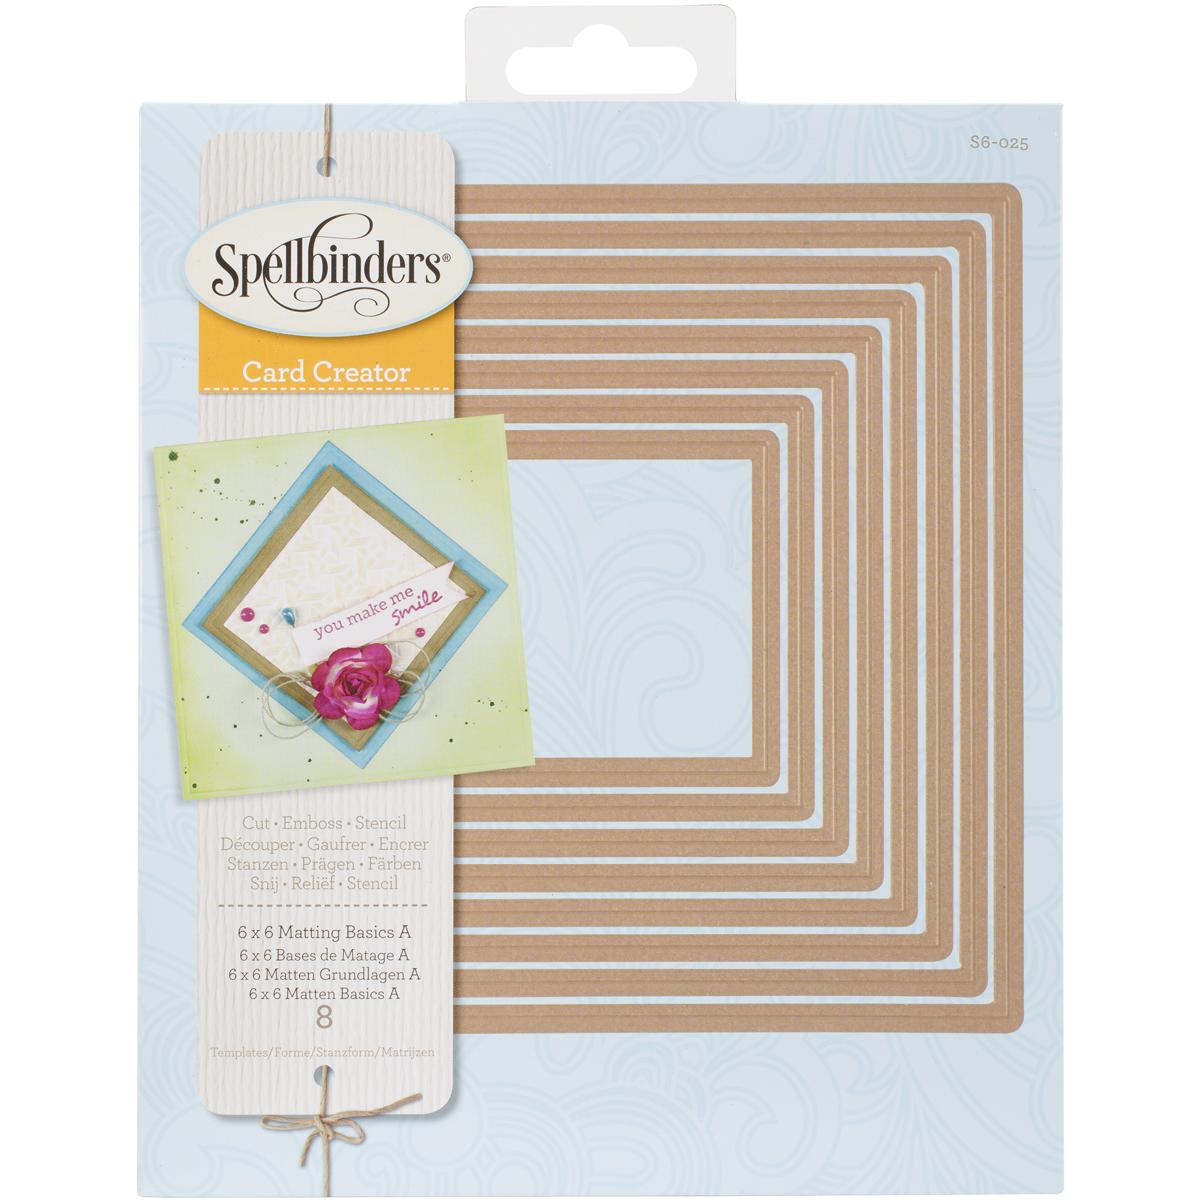 Spellbinders Card Creator Dies 6X6-Matting Basics A